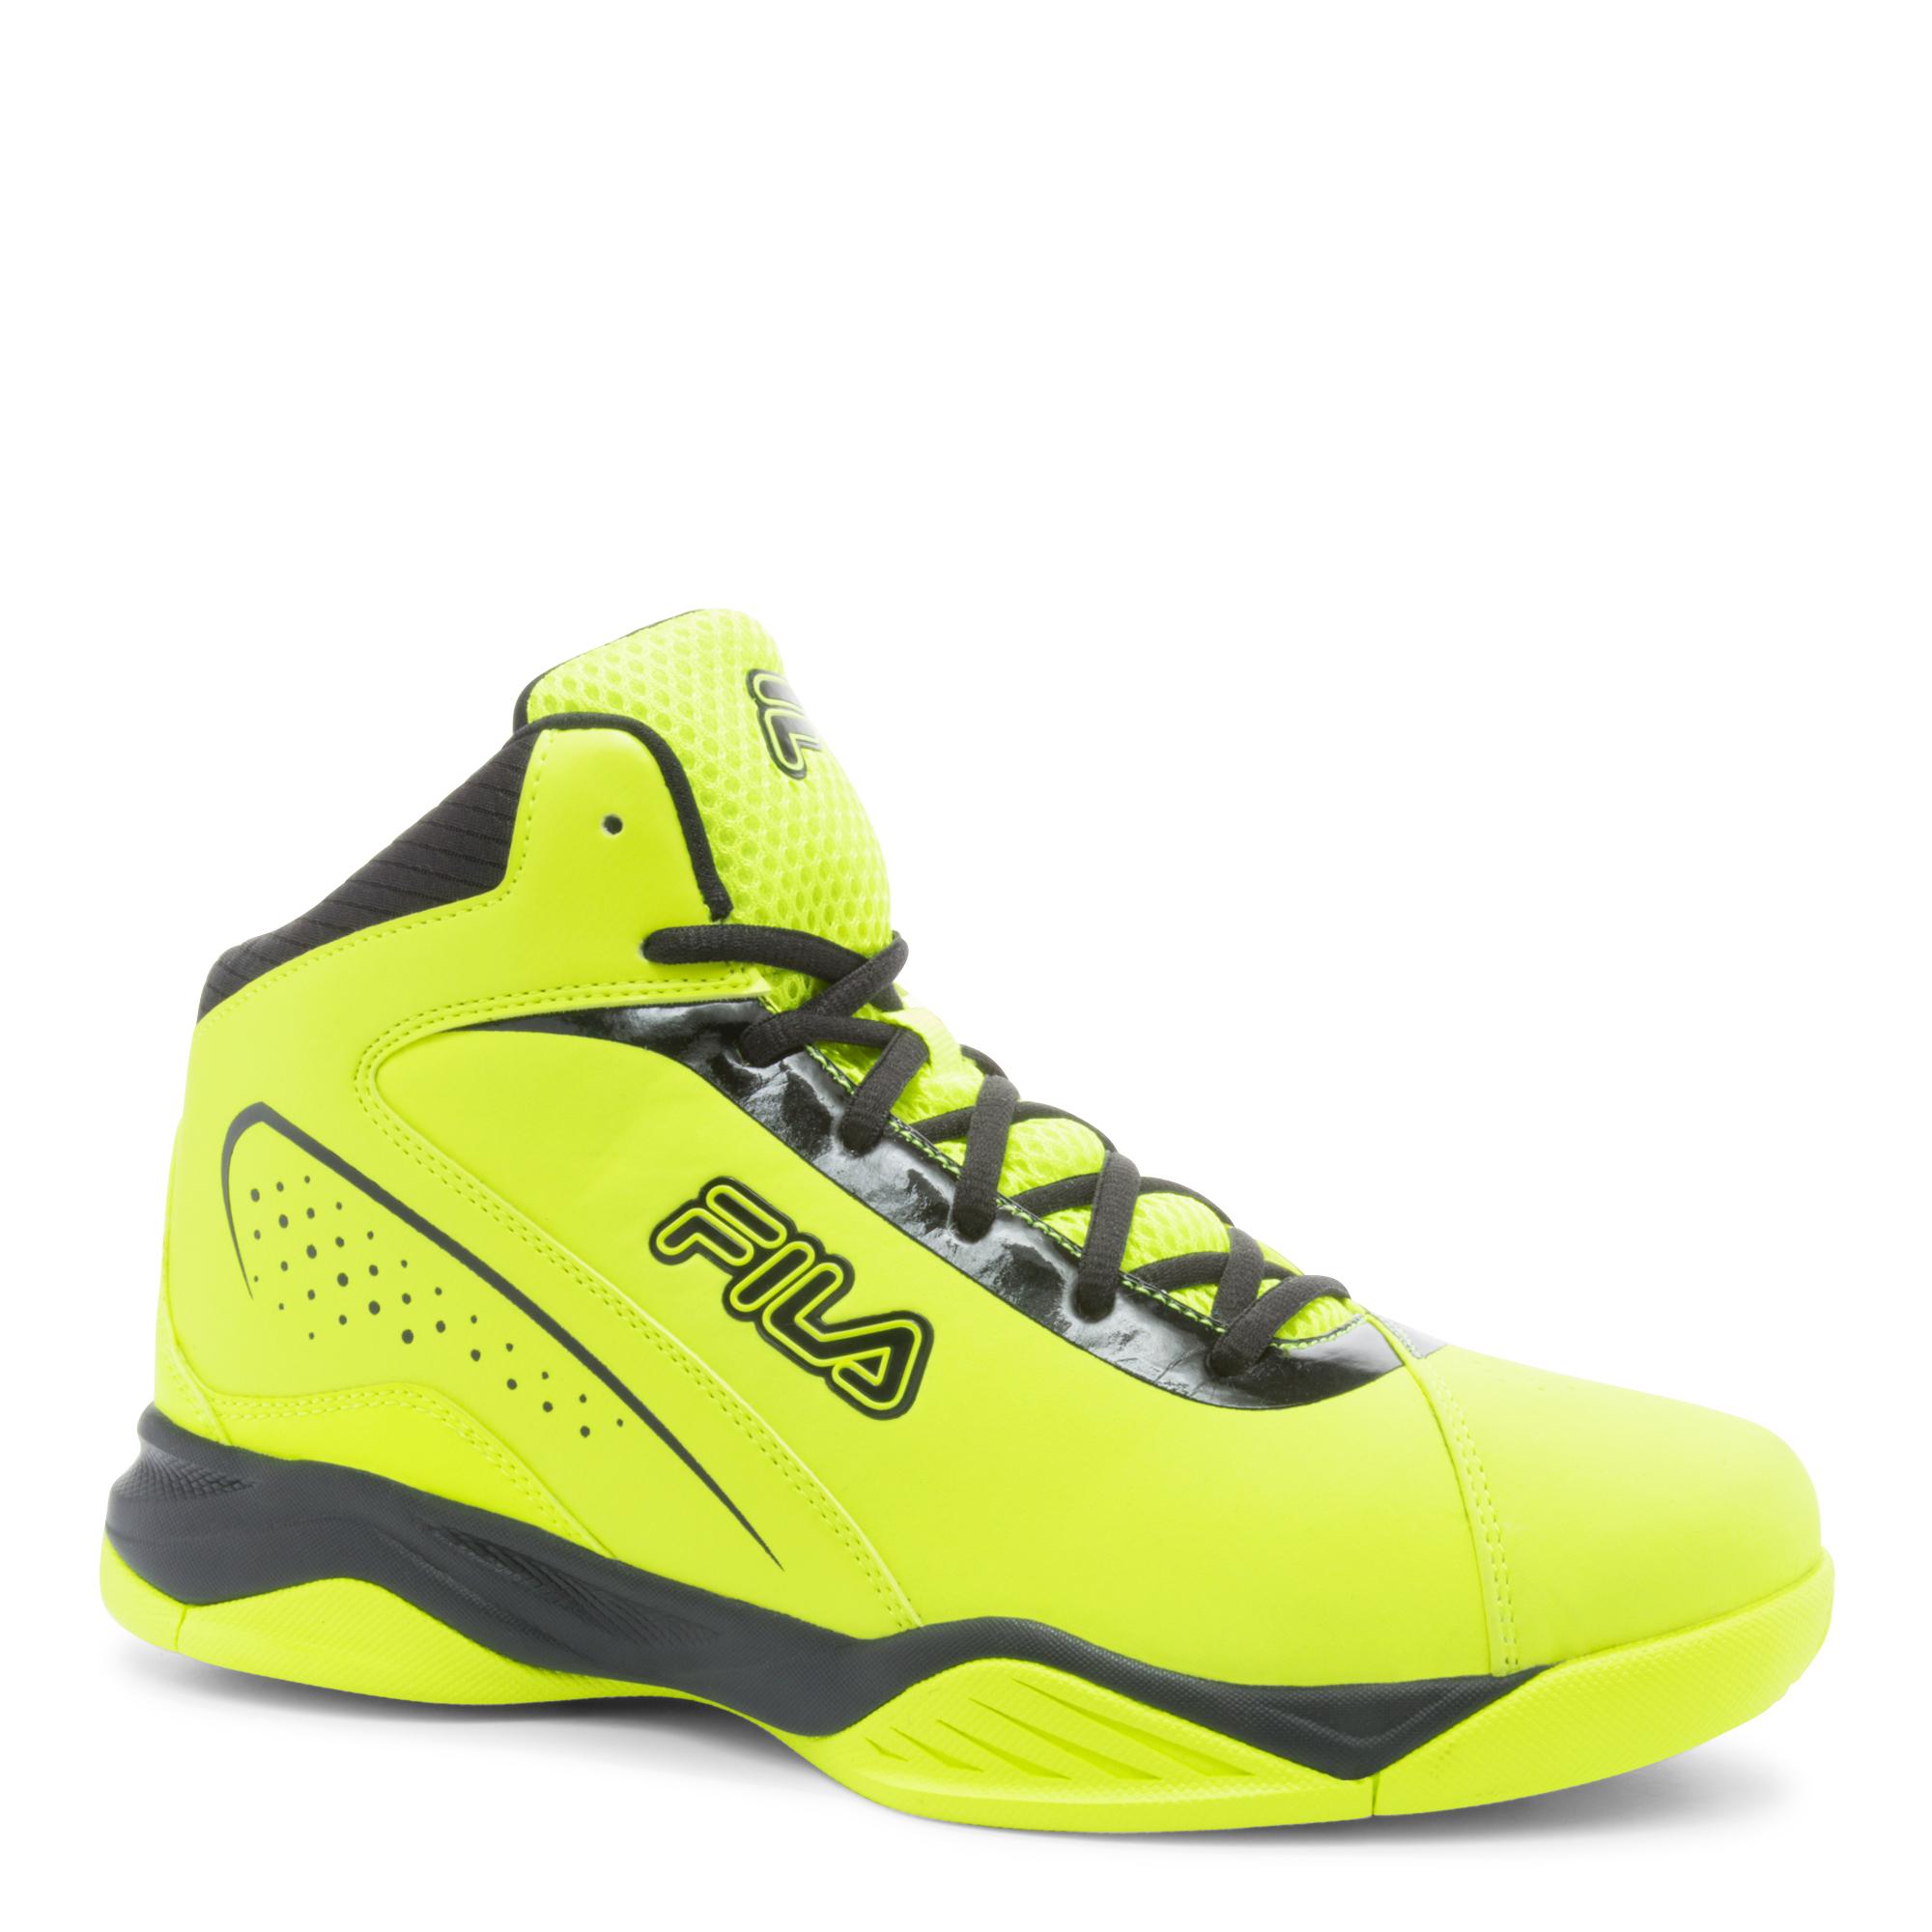 All Fila Basketball Shoes